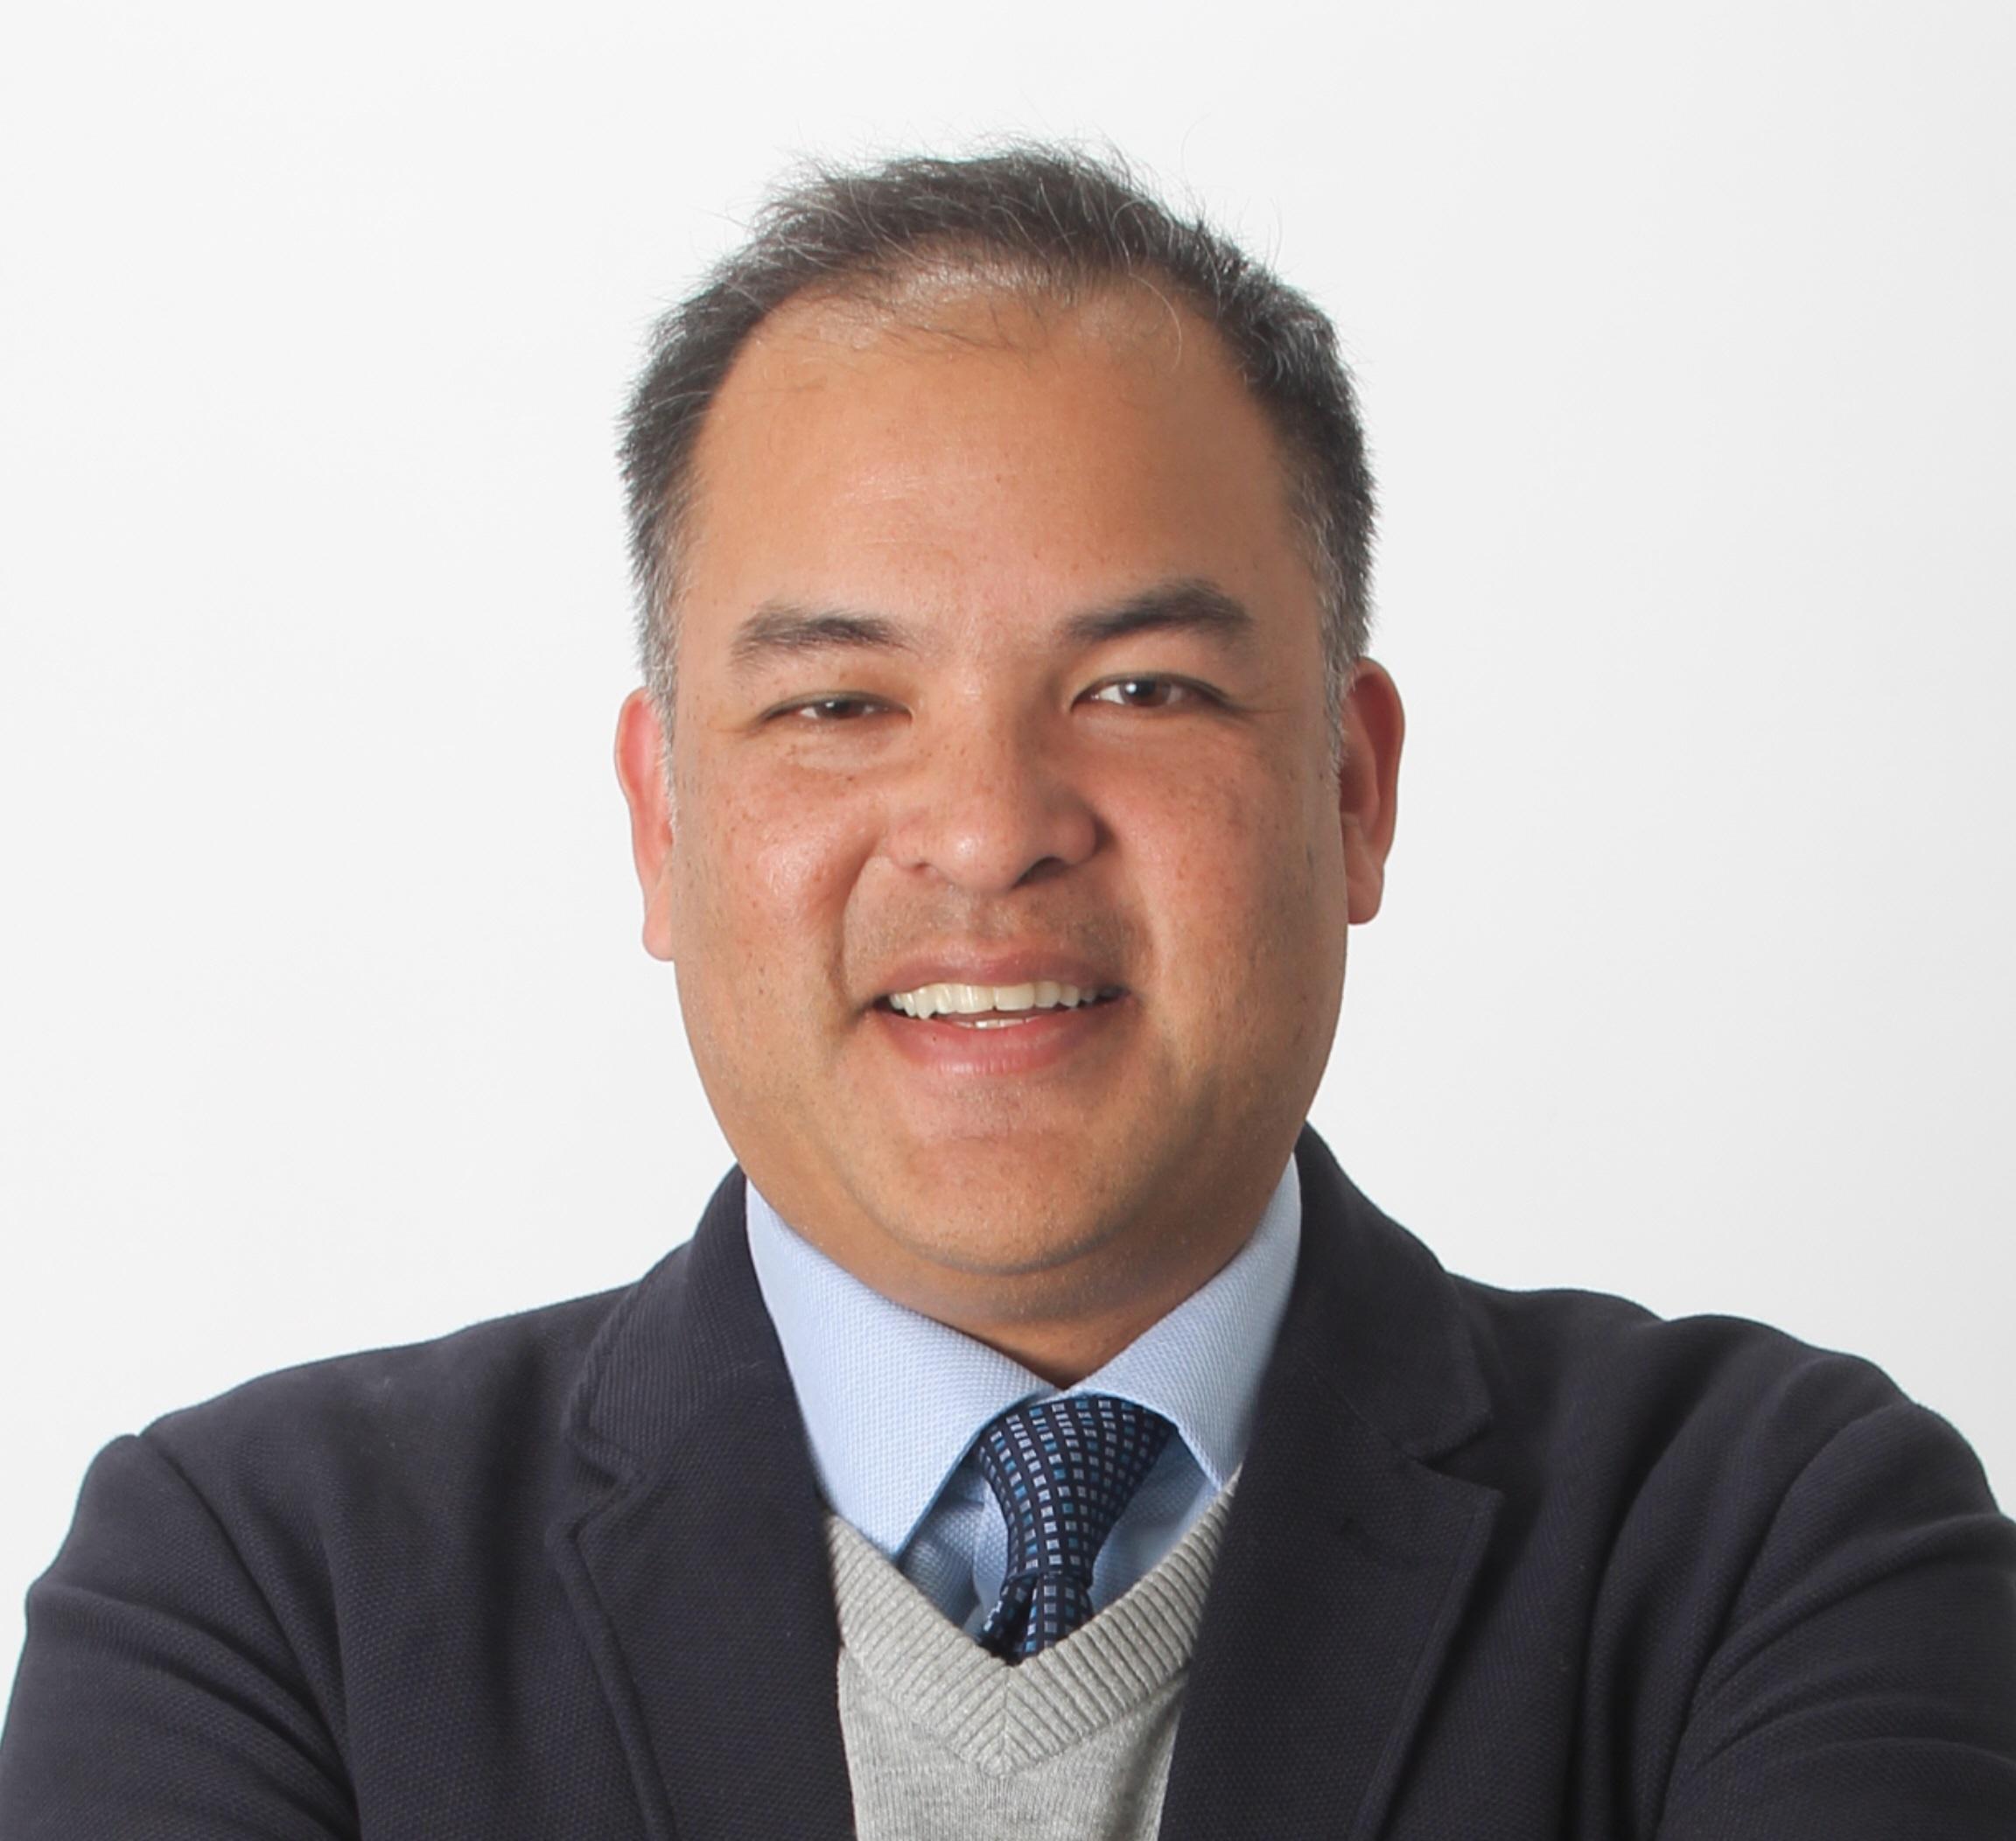 Manuel Quiogue